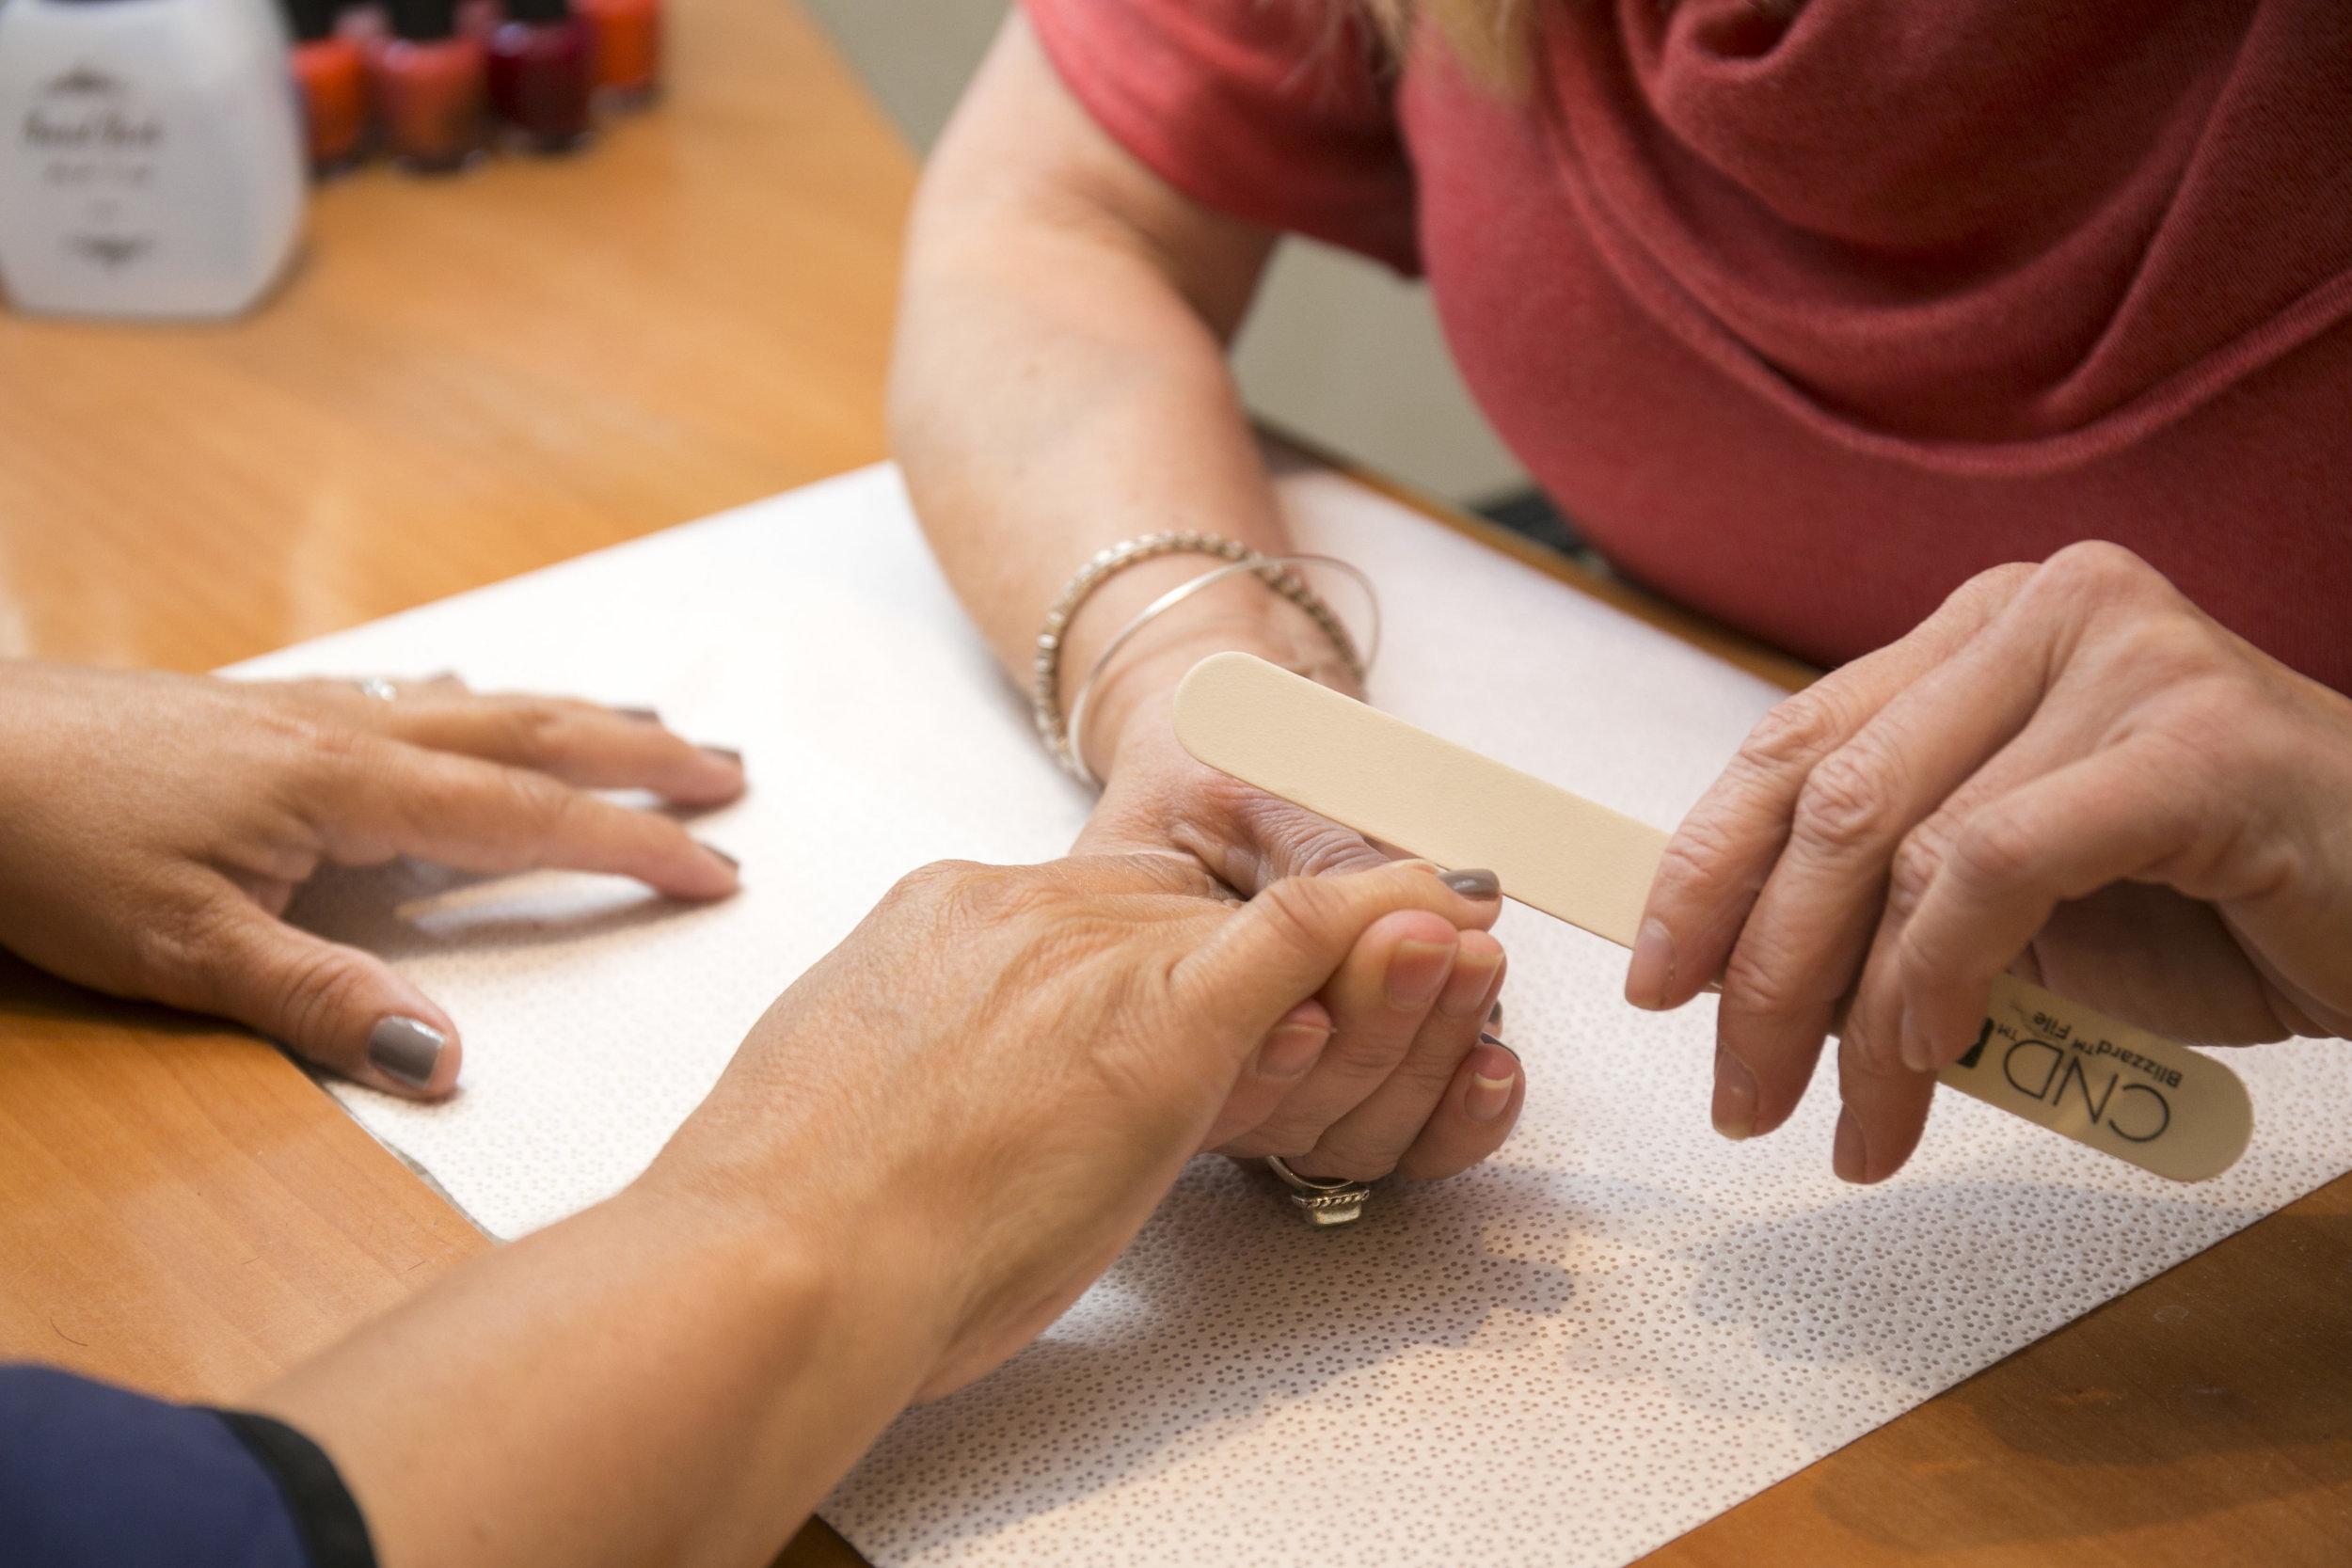 Manicure - Regular, Shellac, Acrylic Set, Acrylic fill-in